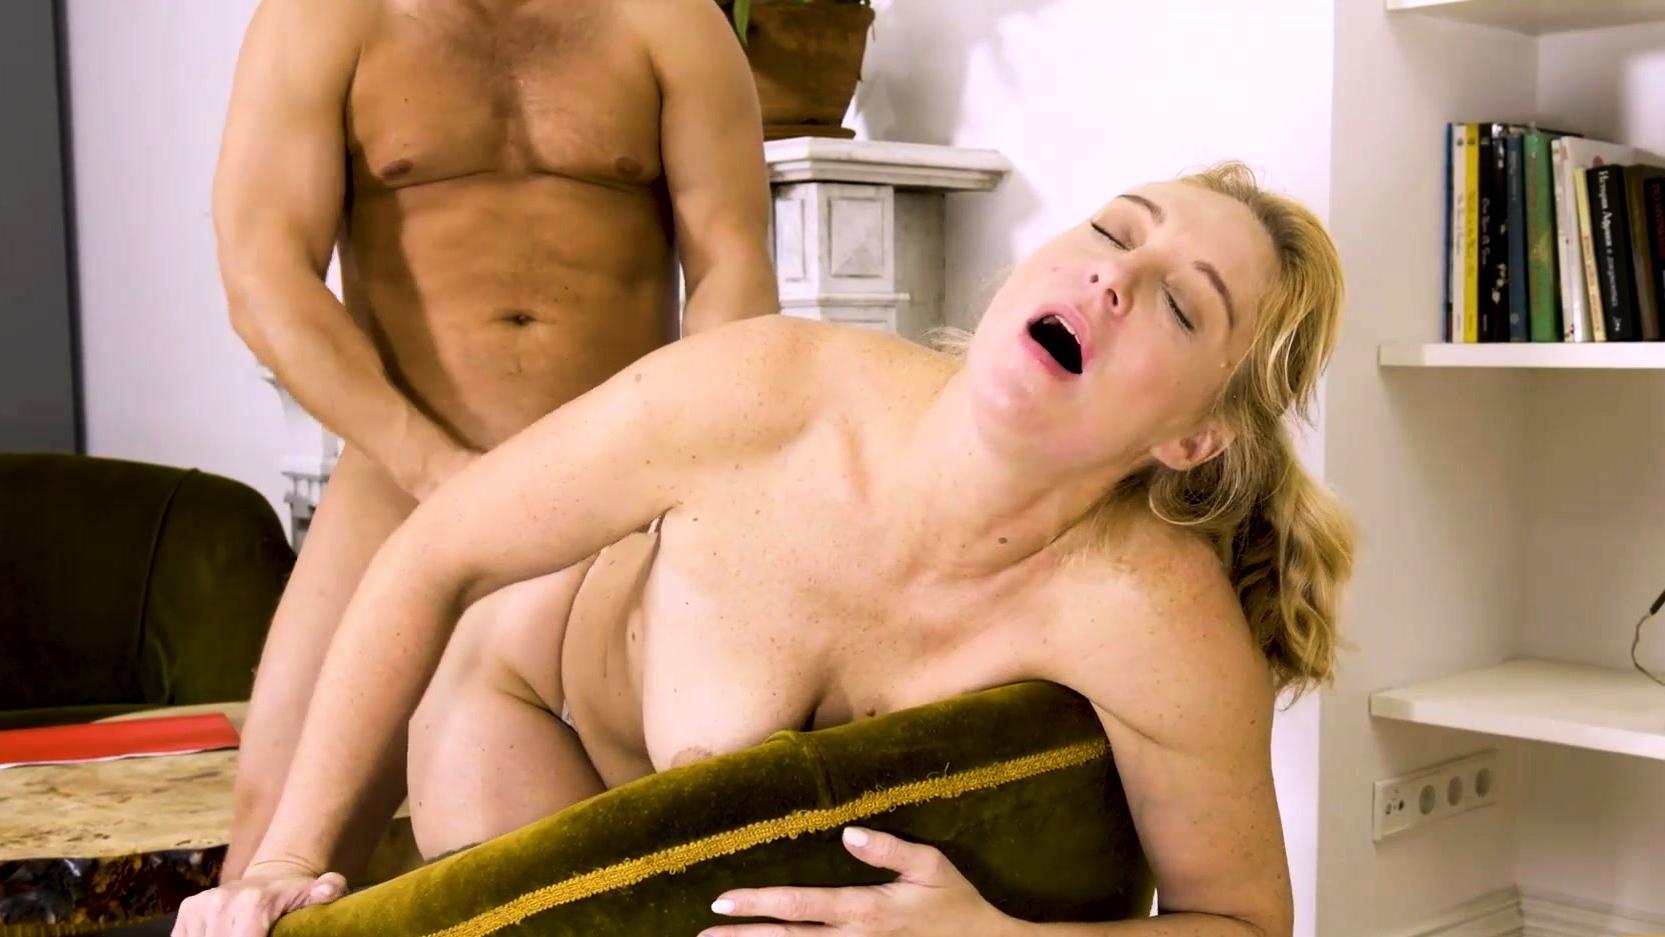 Mature4k. Mature Woman In Stockings Has Vagina Penetrated